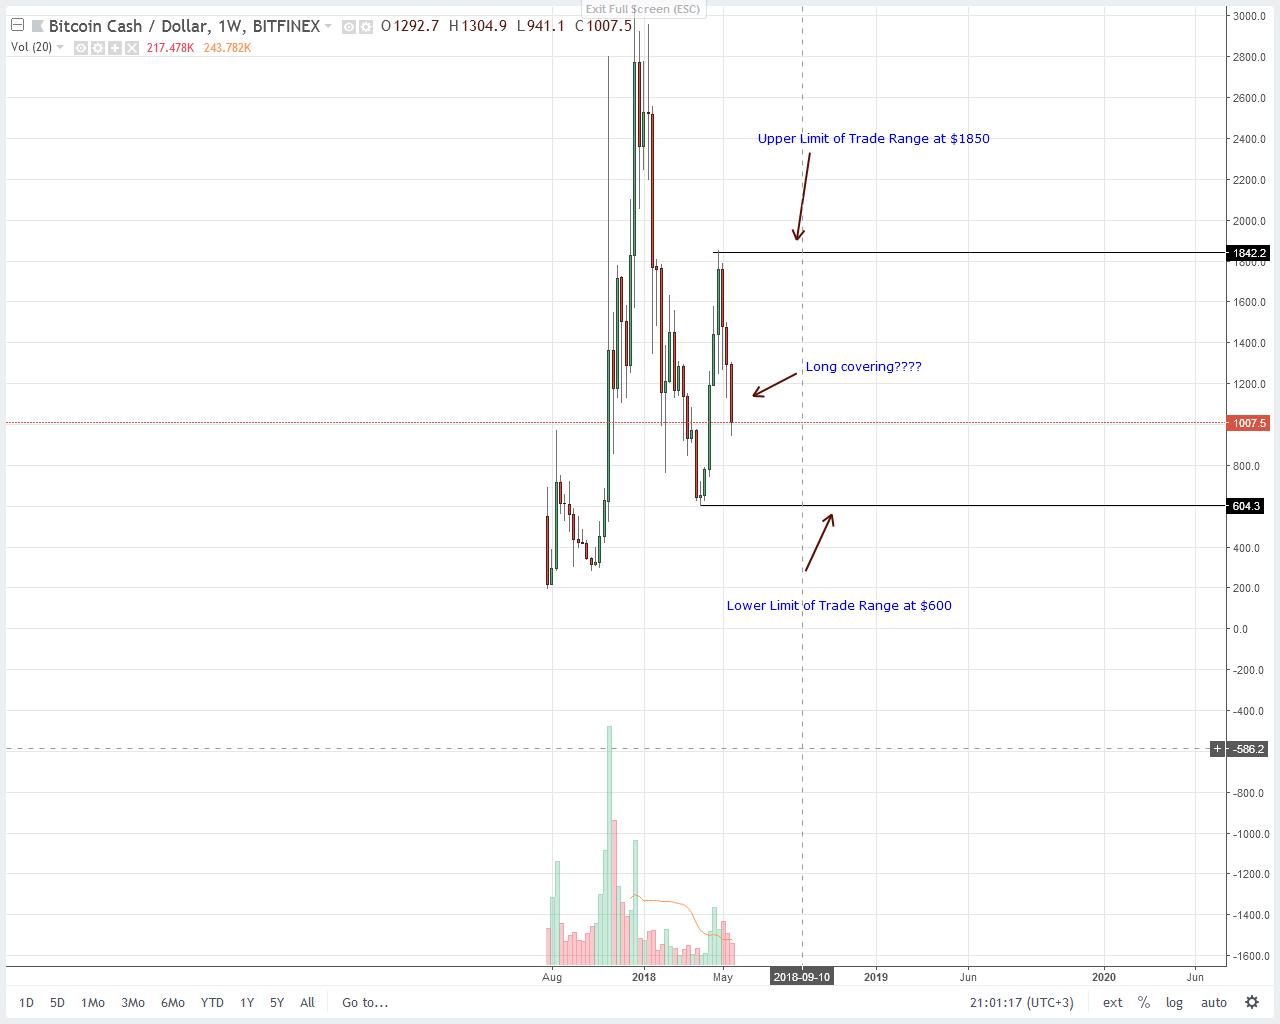 Bitcoin Cash (BCH) Price Analysis